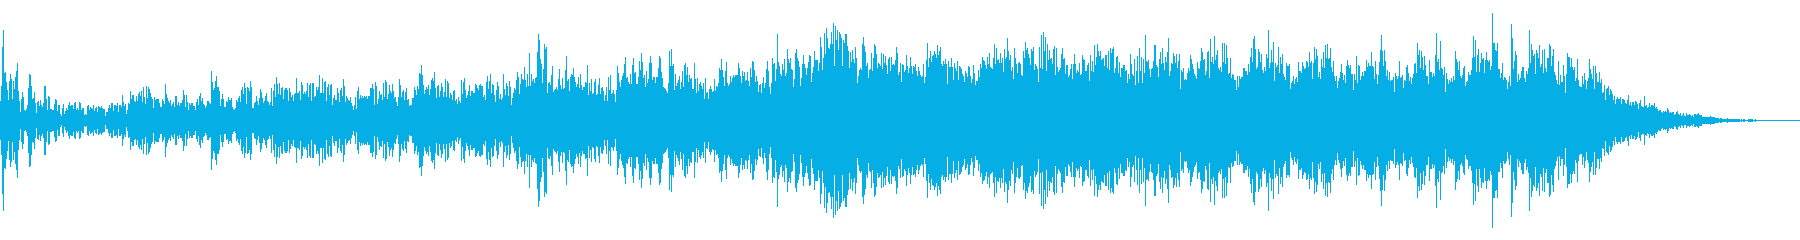 Space Fx:R2スマッシャーの再生済みの波形